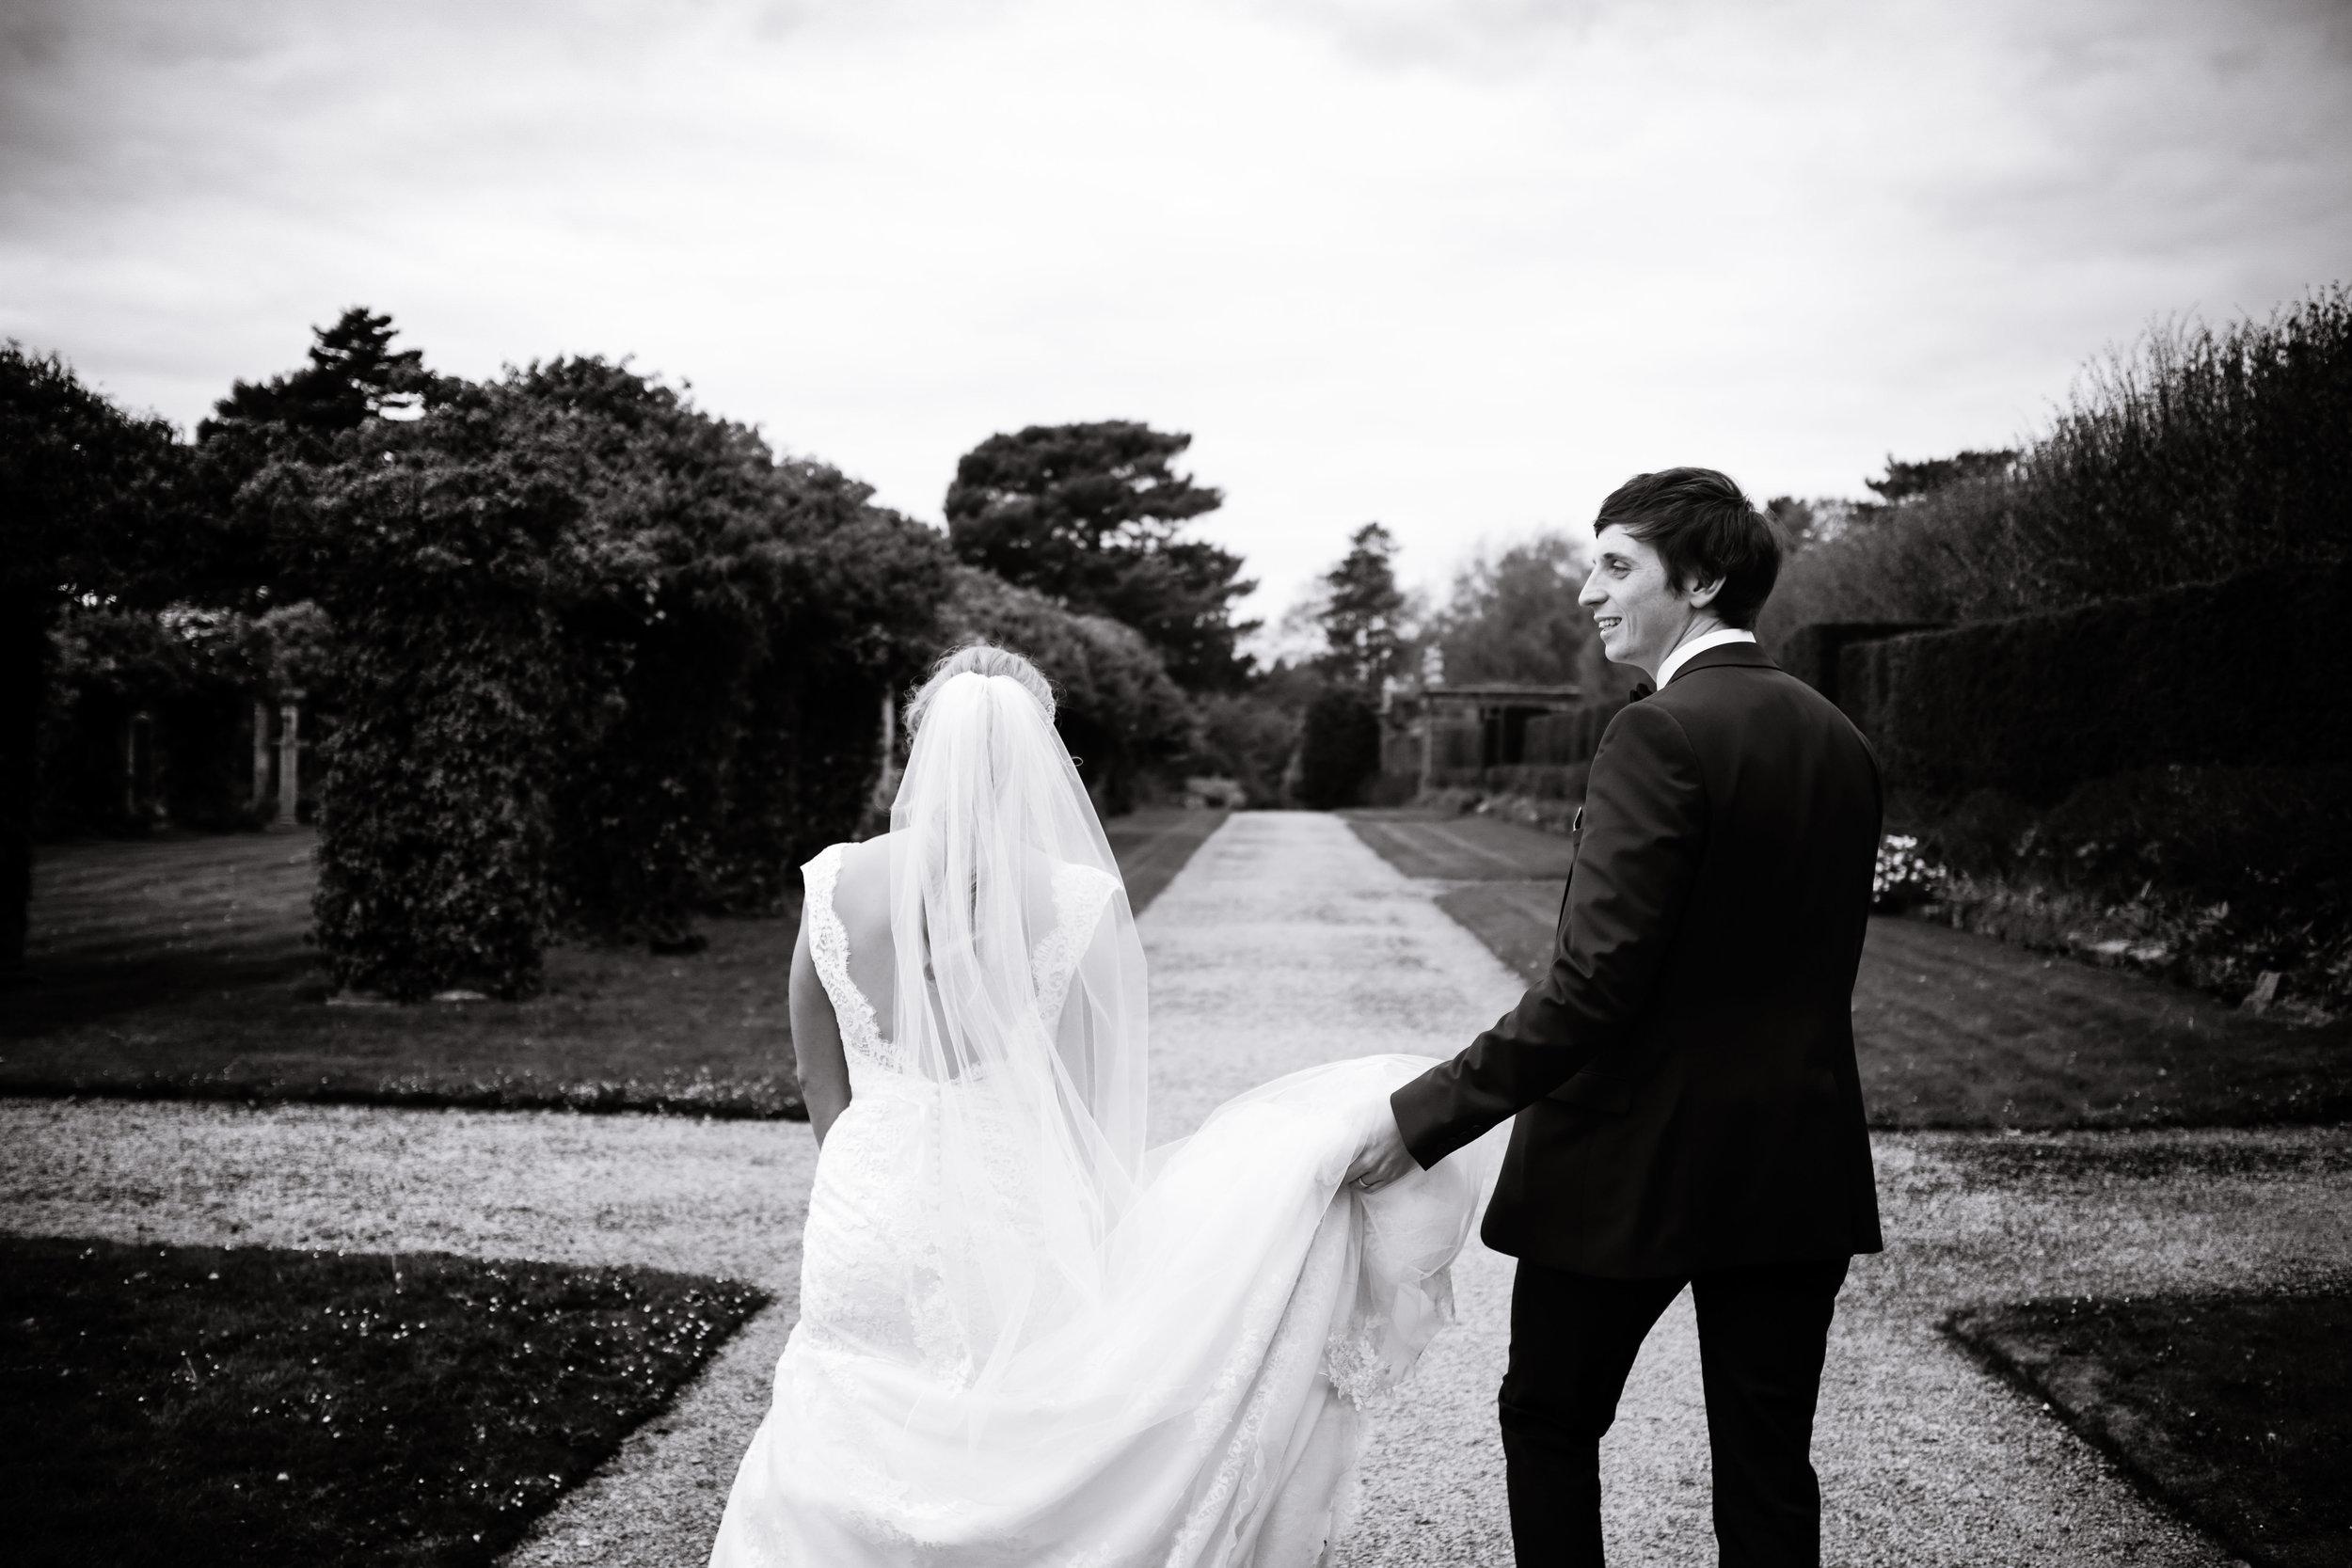 Thornton manor wedding photography cheshire wedding photographer liverpool manchester warrington chester wirral wedding BLOG (77 of 108).jpg